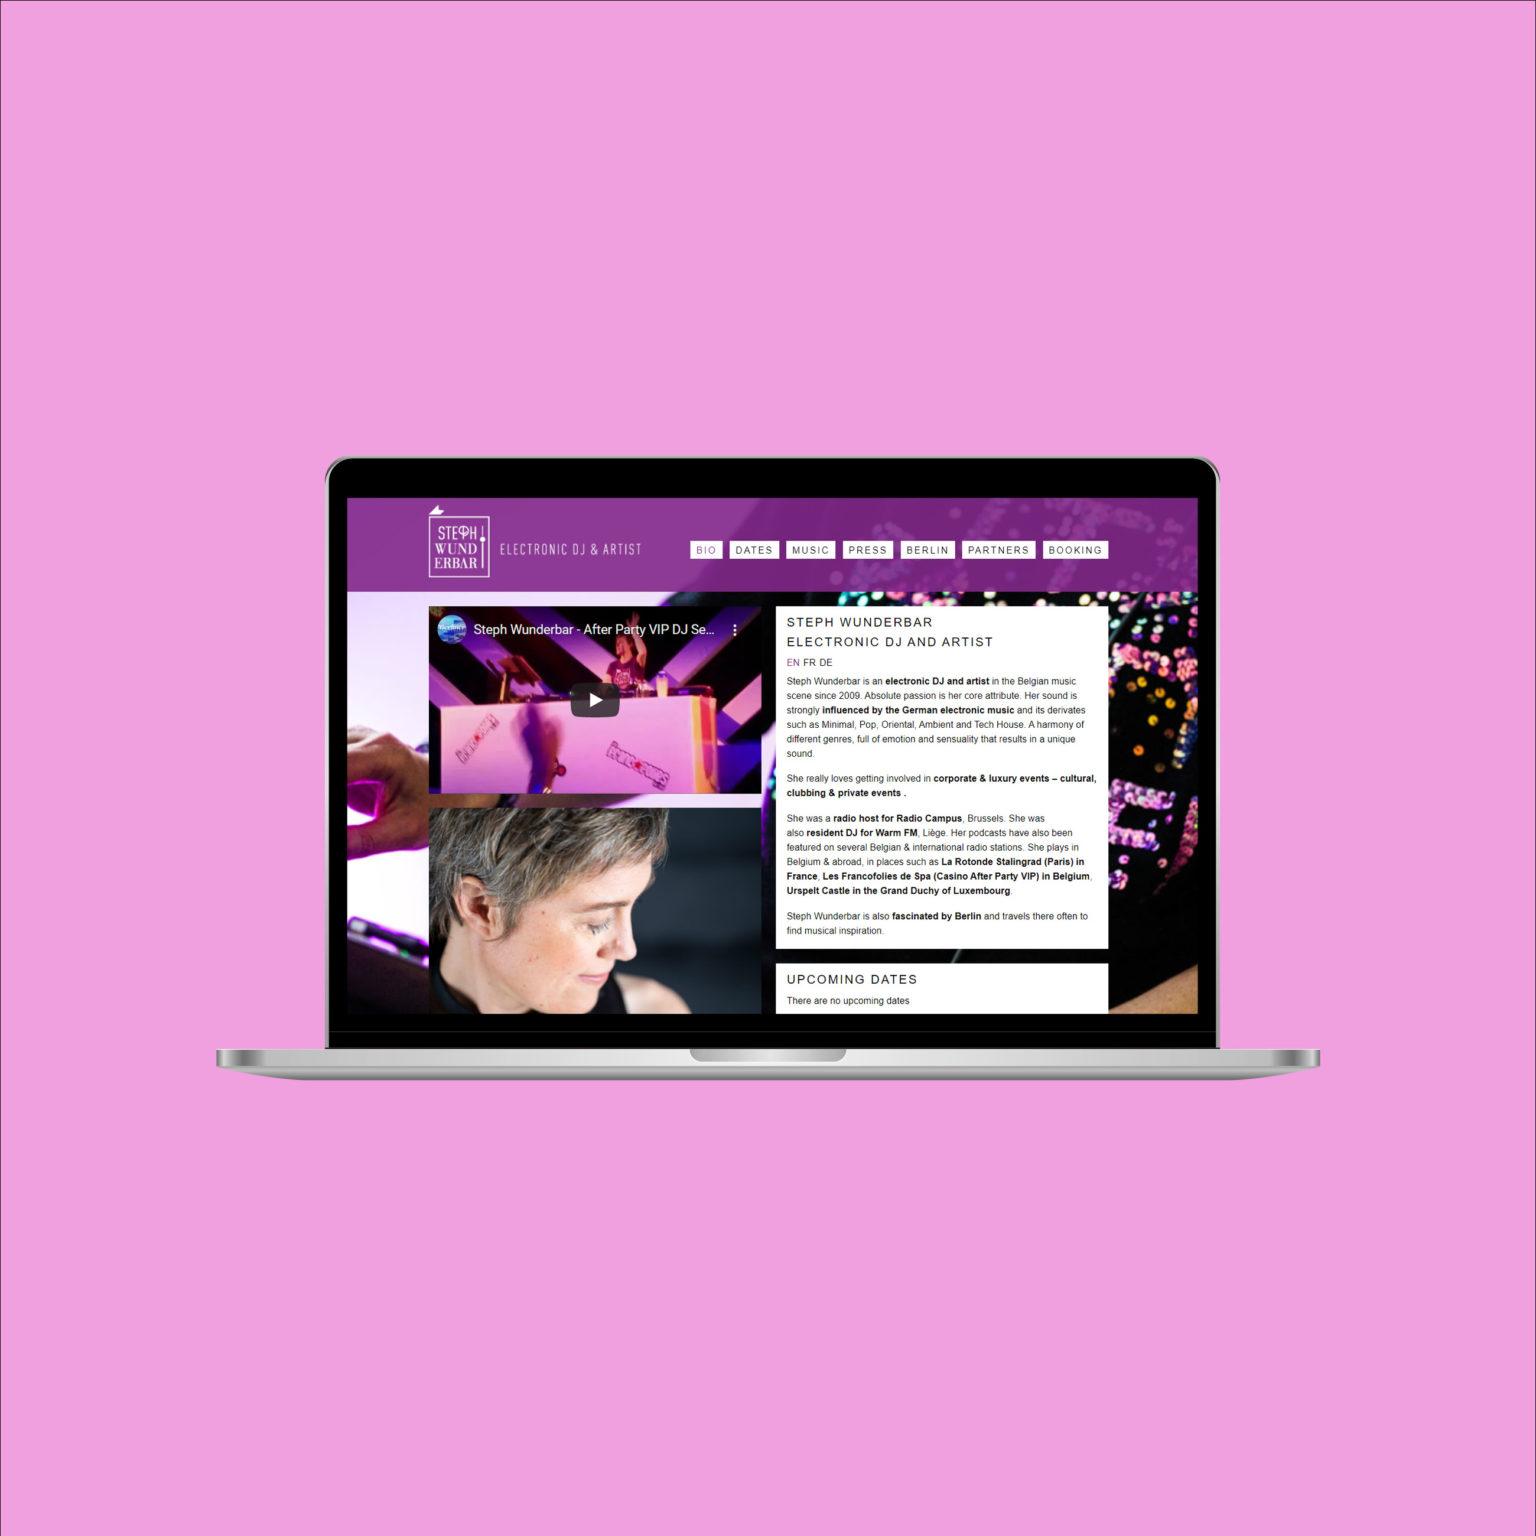 Miko Digital Agence web à Liège - Steph Wunderbar